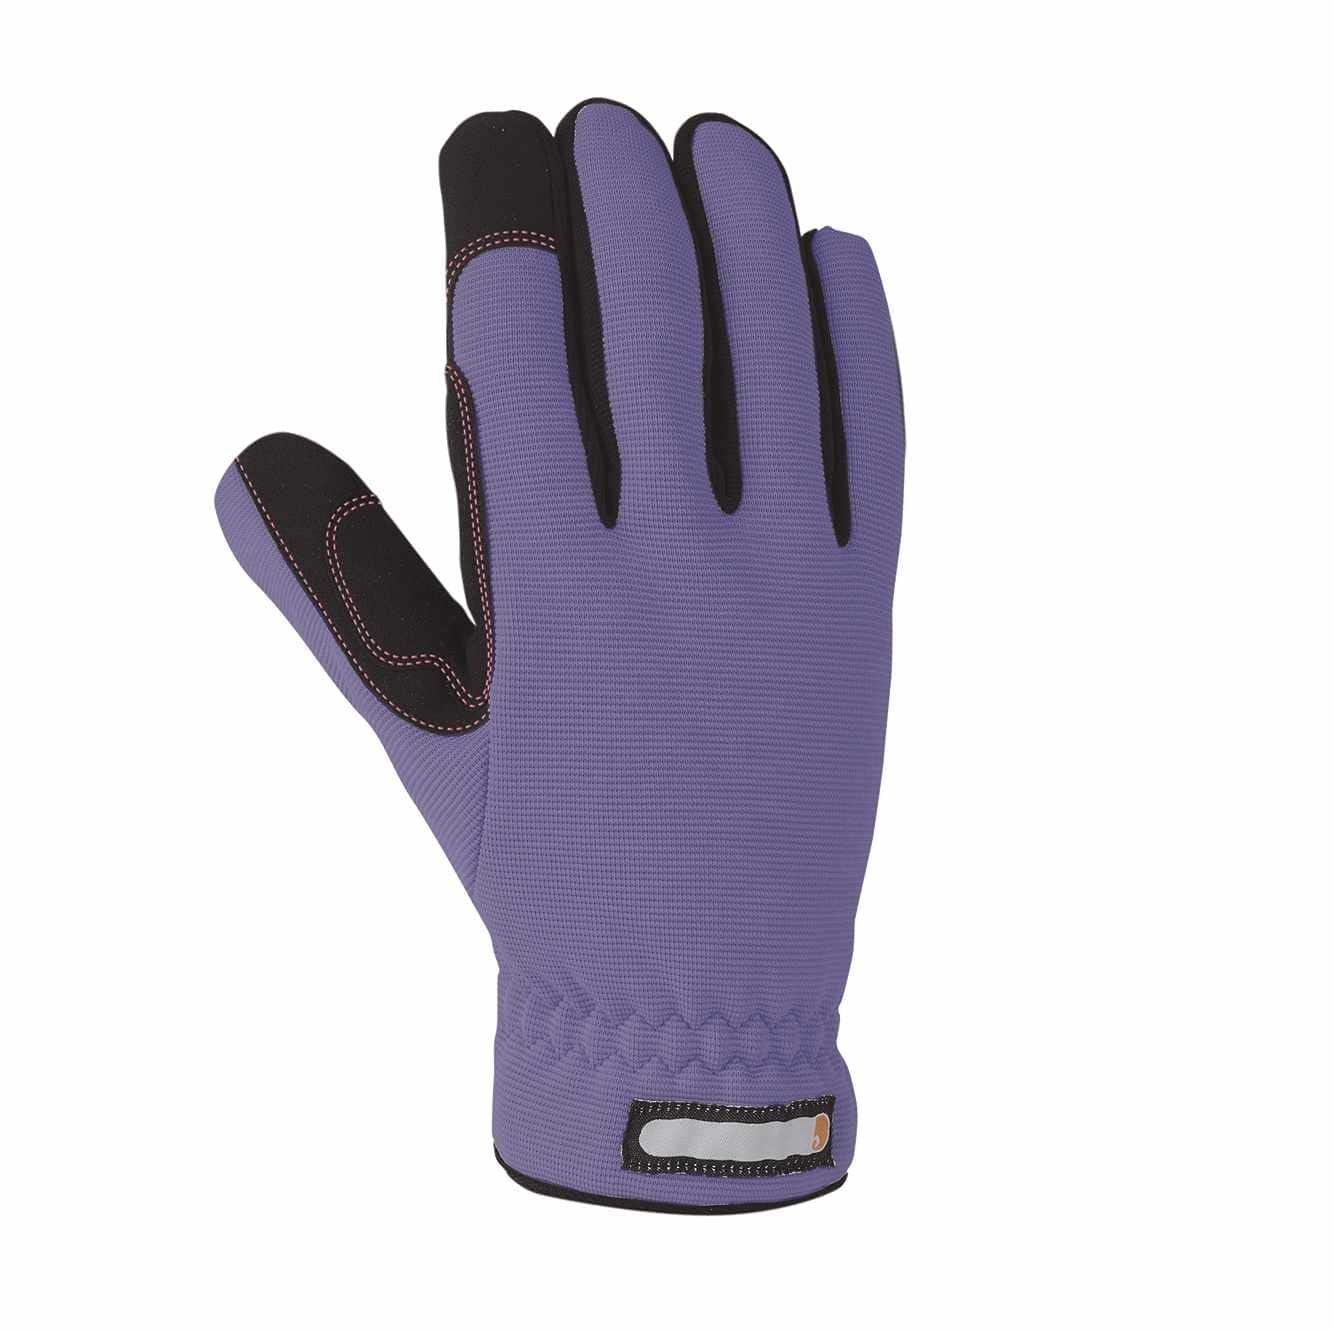 WA547 Women's Carhartt Work Flex Glove